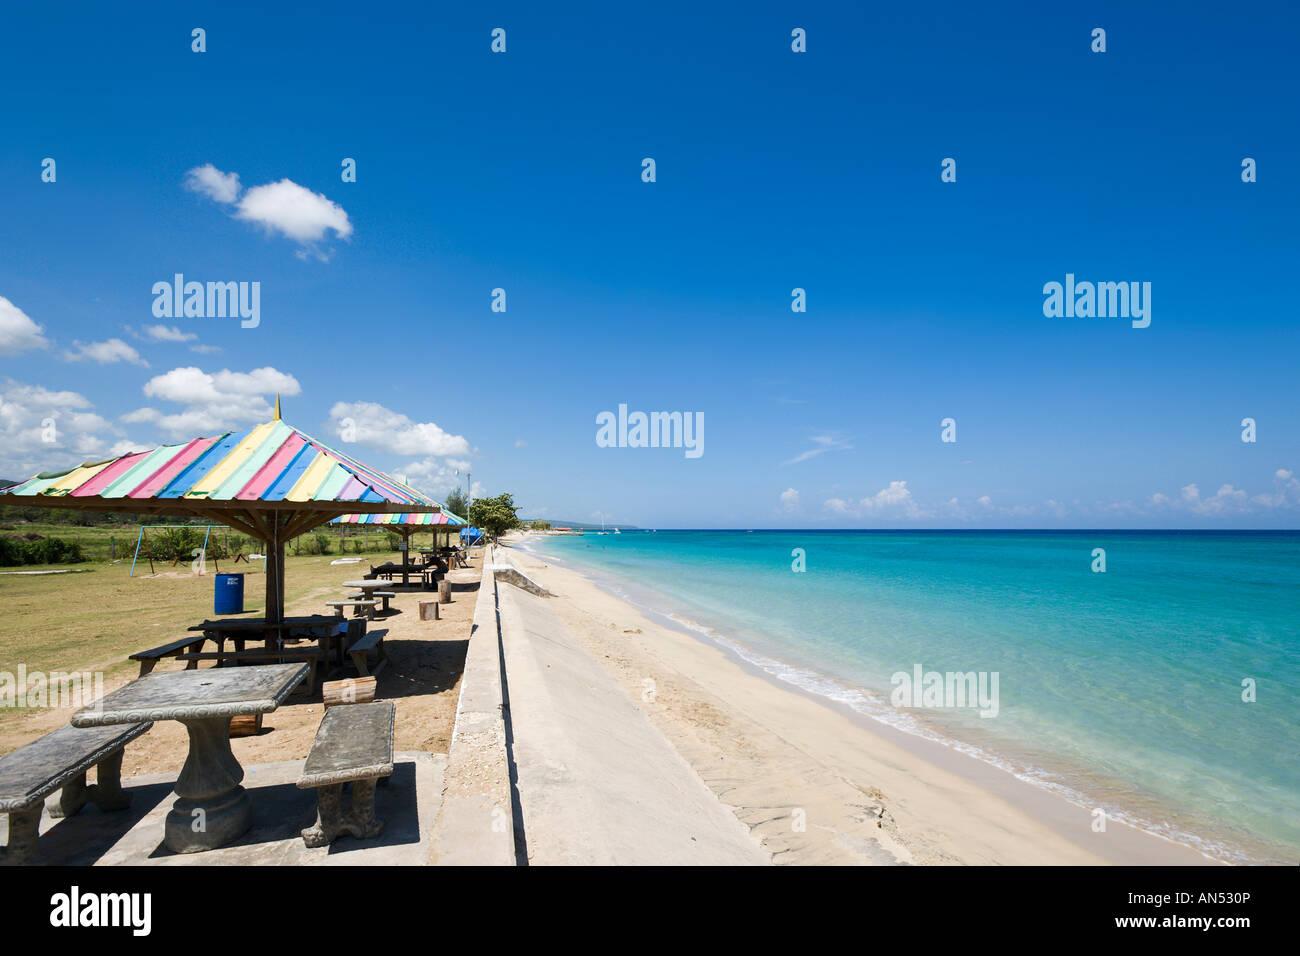 Area Picnic in Runaway Bay Beach, costa Nord, in Giamaica, Caraibi, West Indies Immagini Stock